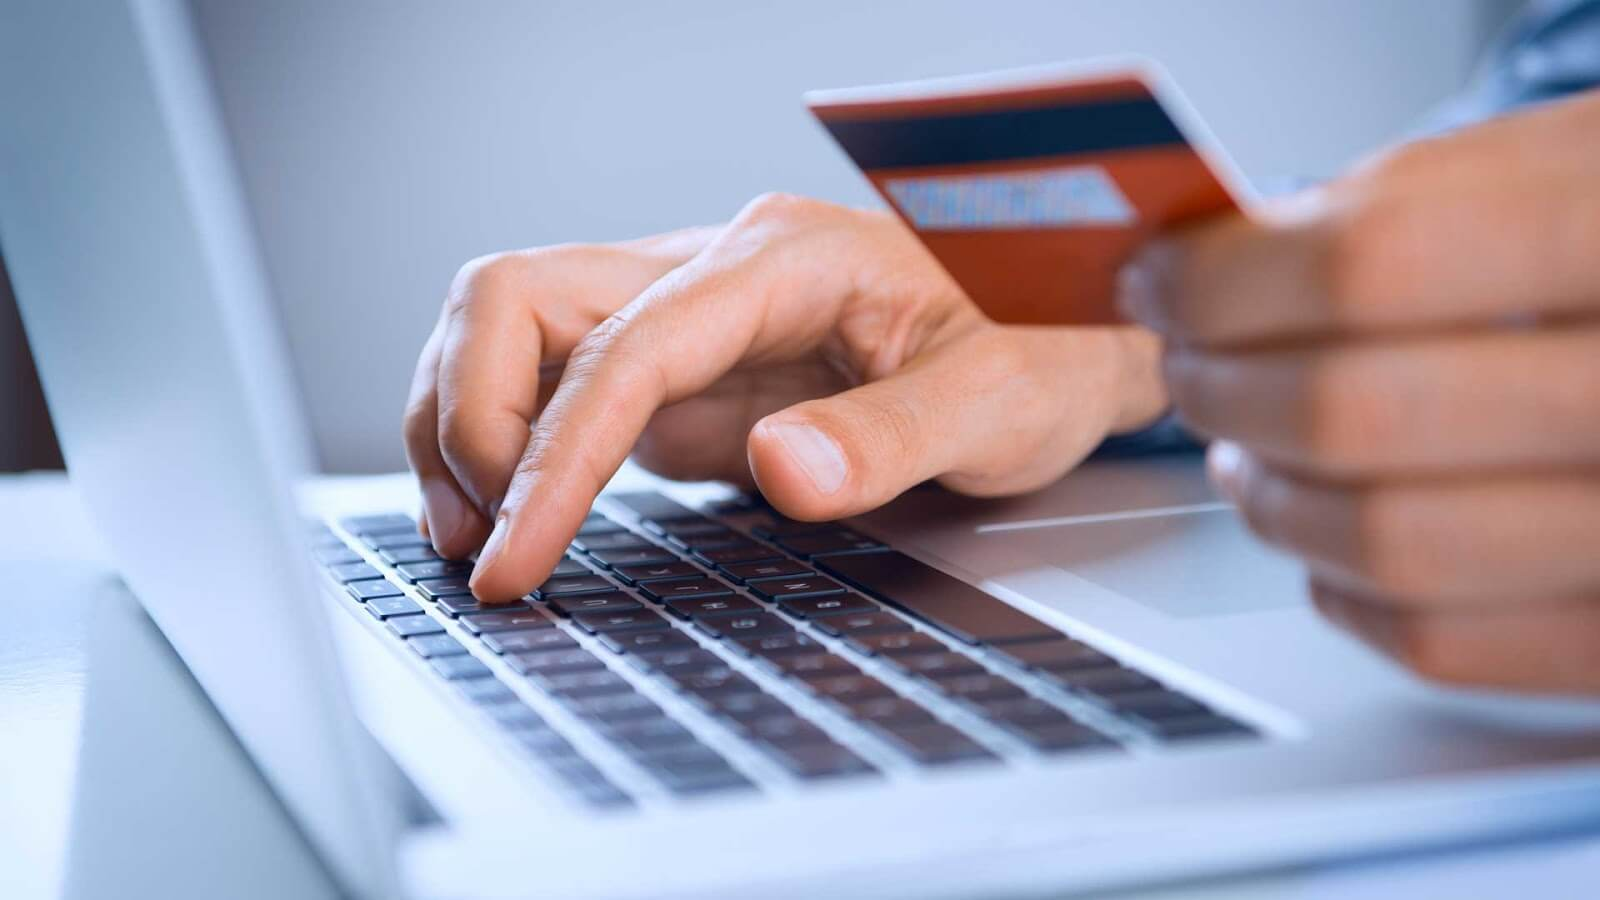 микрокредит в интернете